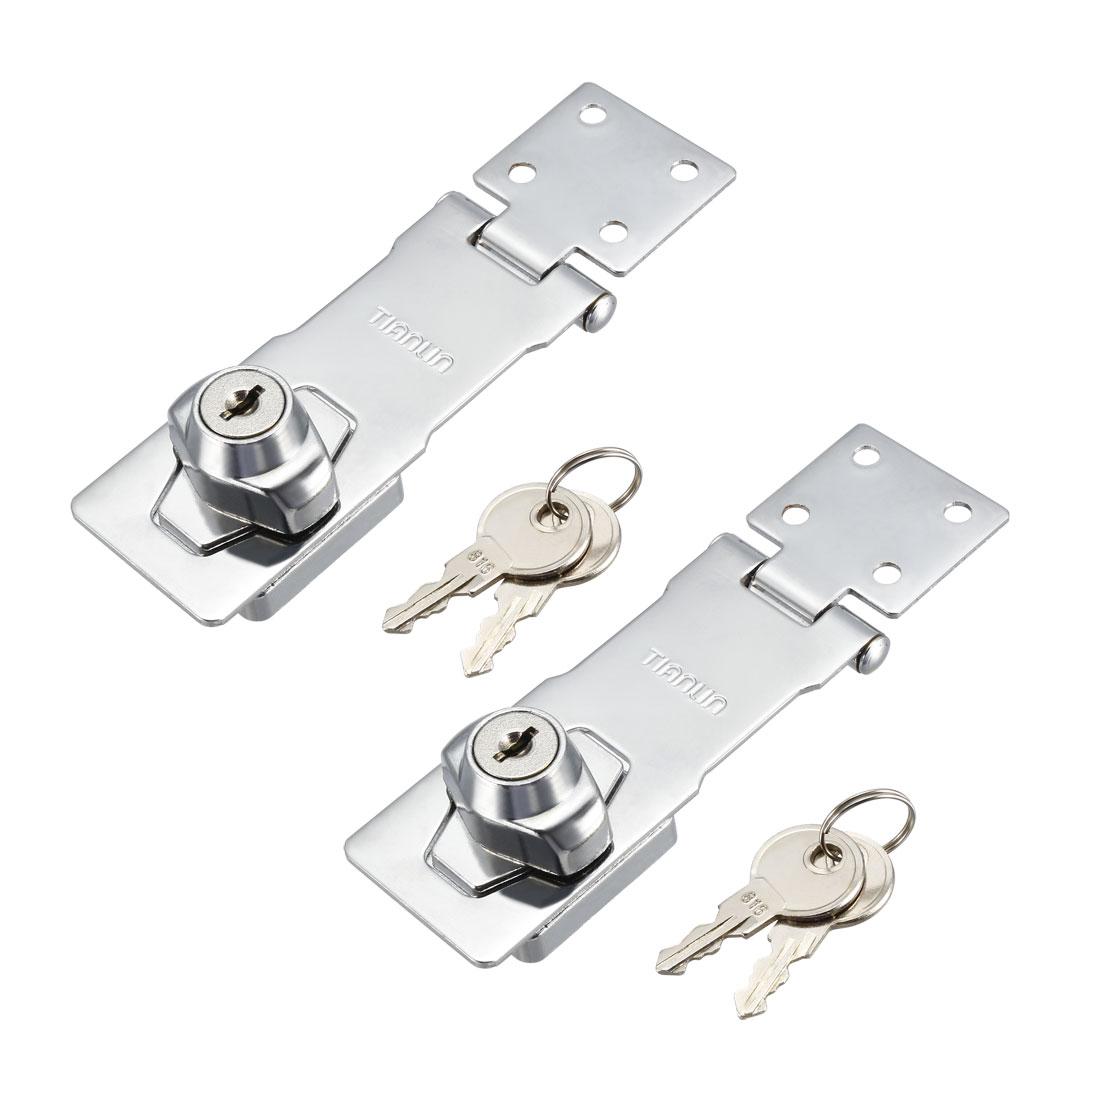 Keyed Hasp Lock 143mm Twist Knob Keyed Locking Hasp for Door Cabinet 2 Pcs